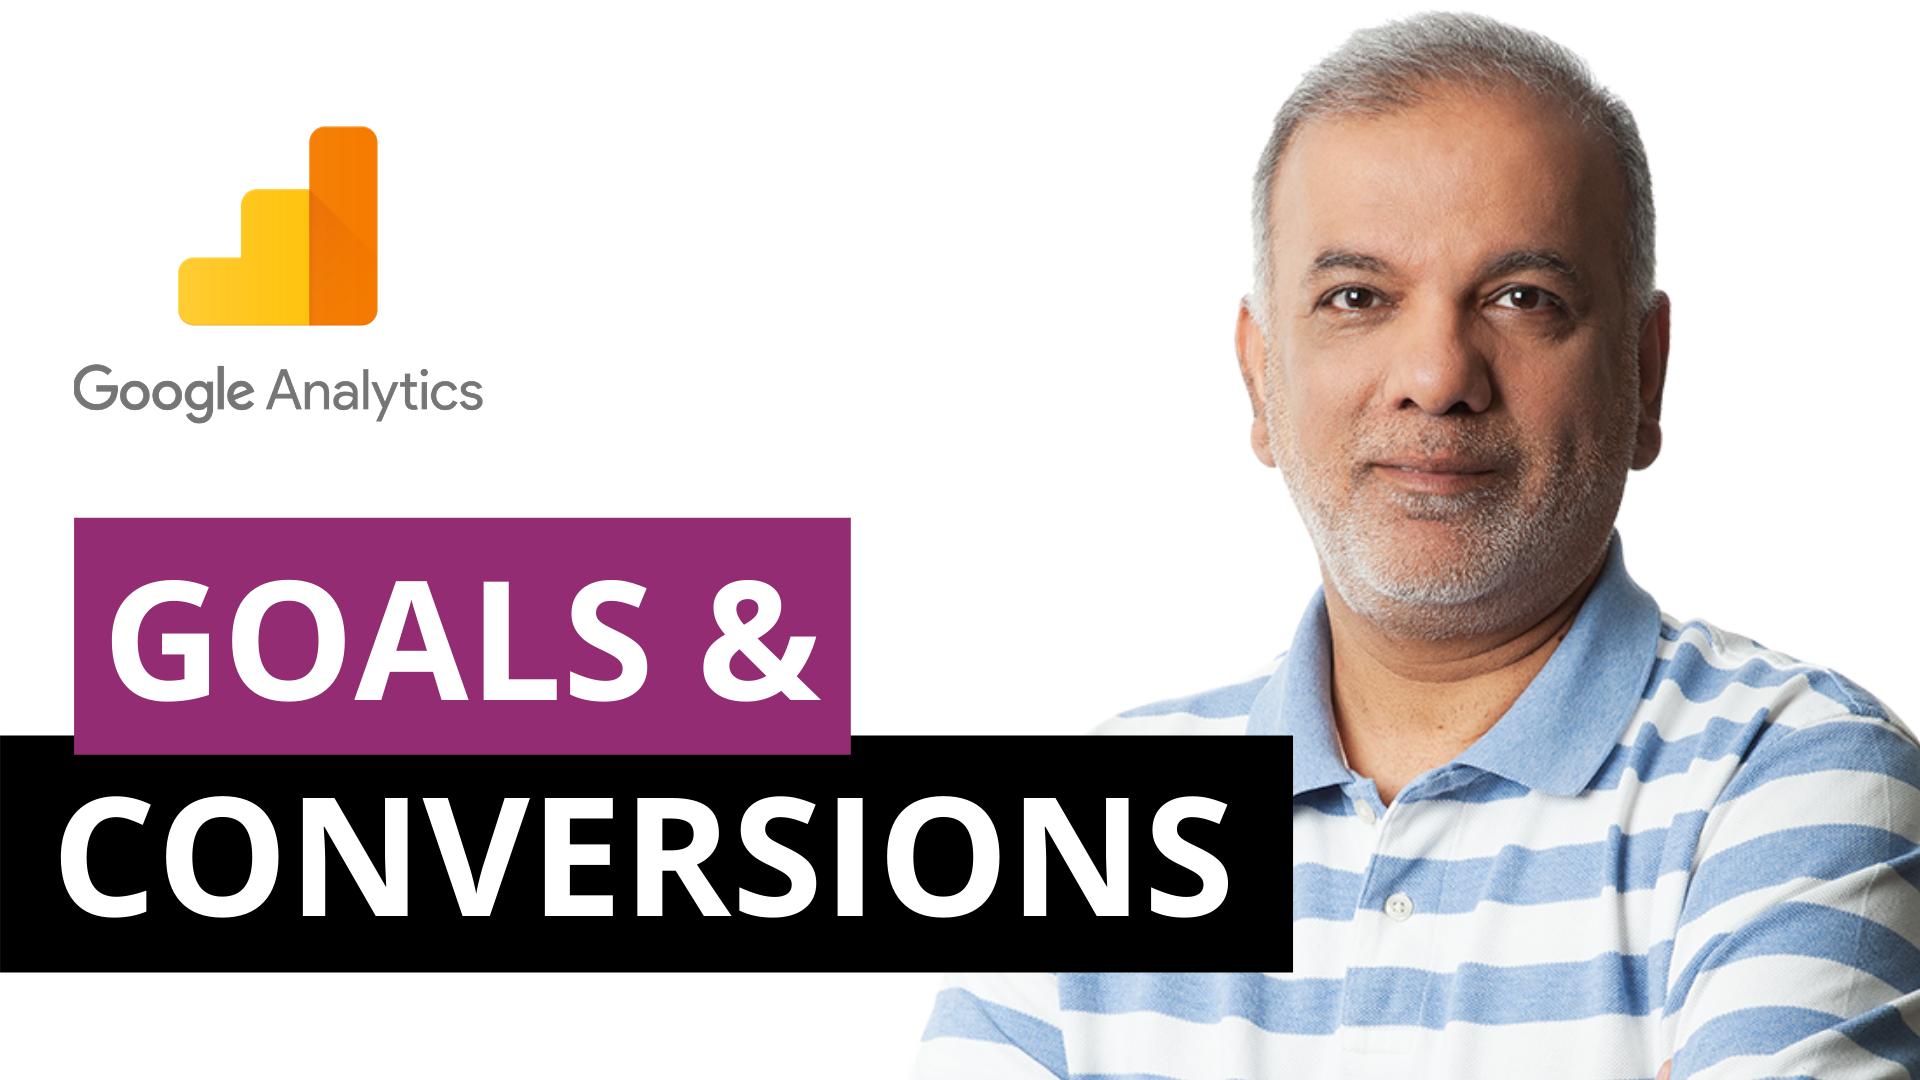 Understanding Google Analytics: Goals & Conversions